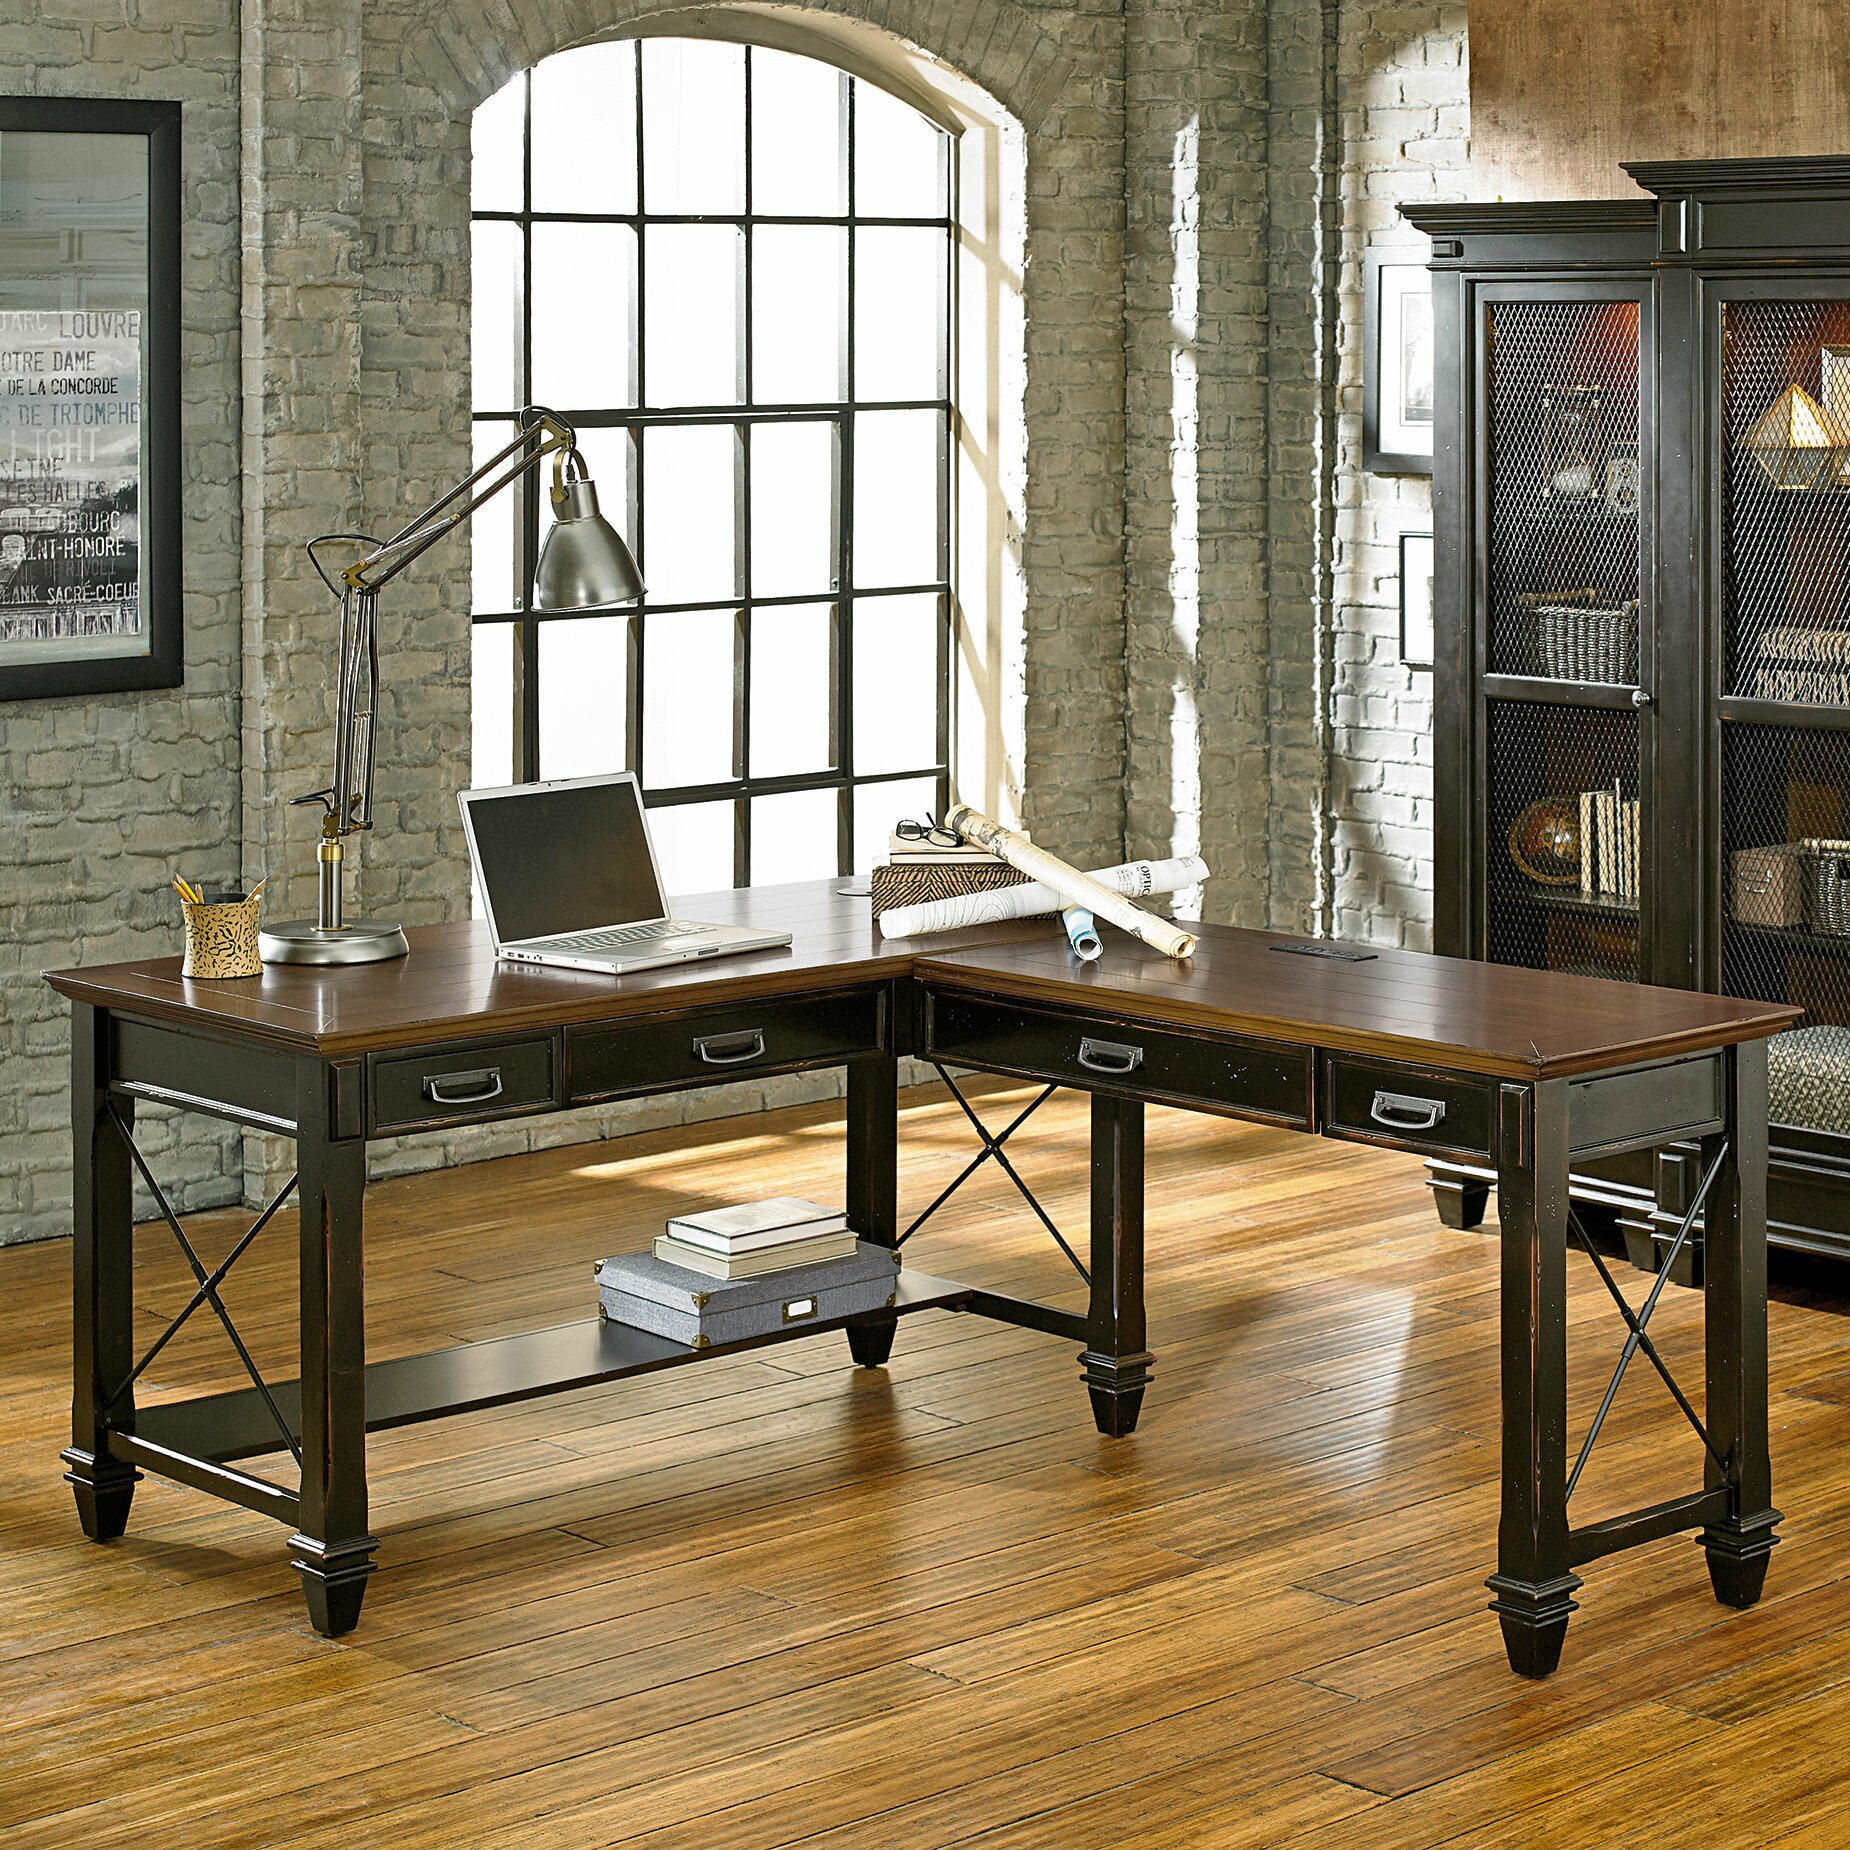 Kathy Ireland Home By Martin Furniture Hartford Writing